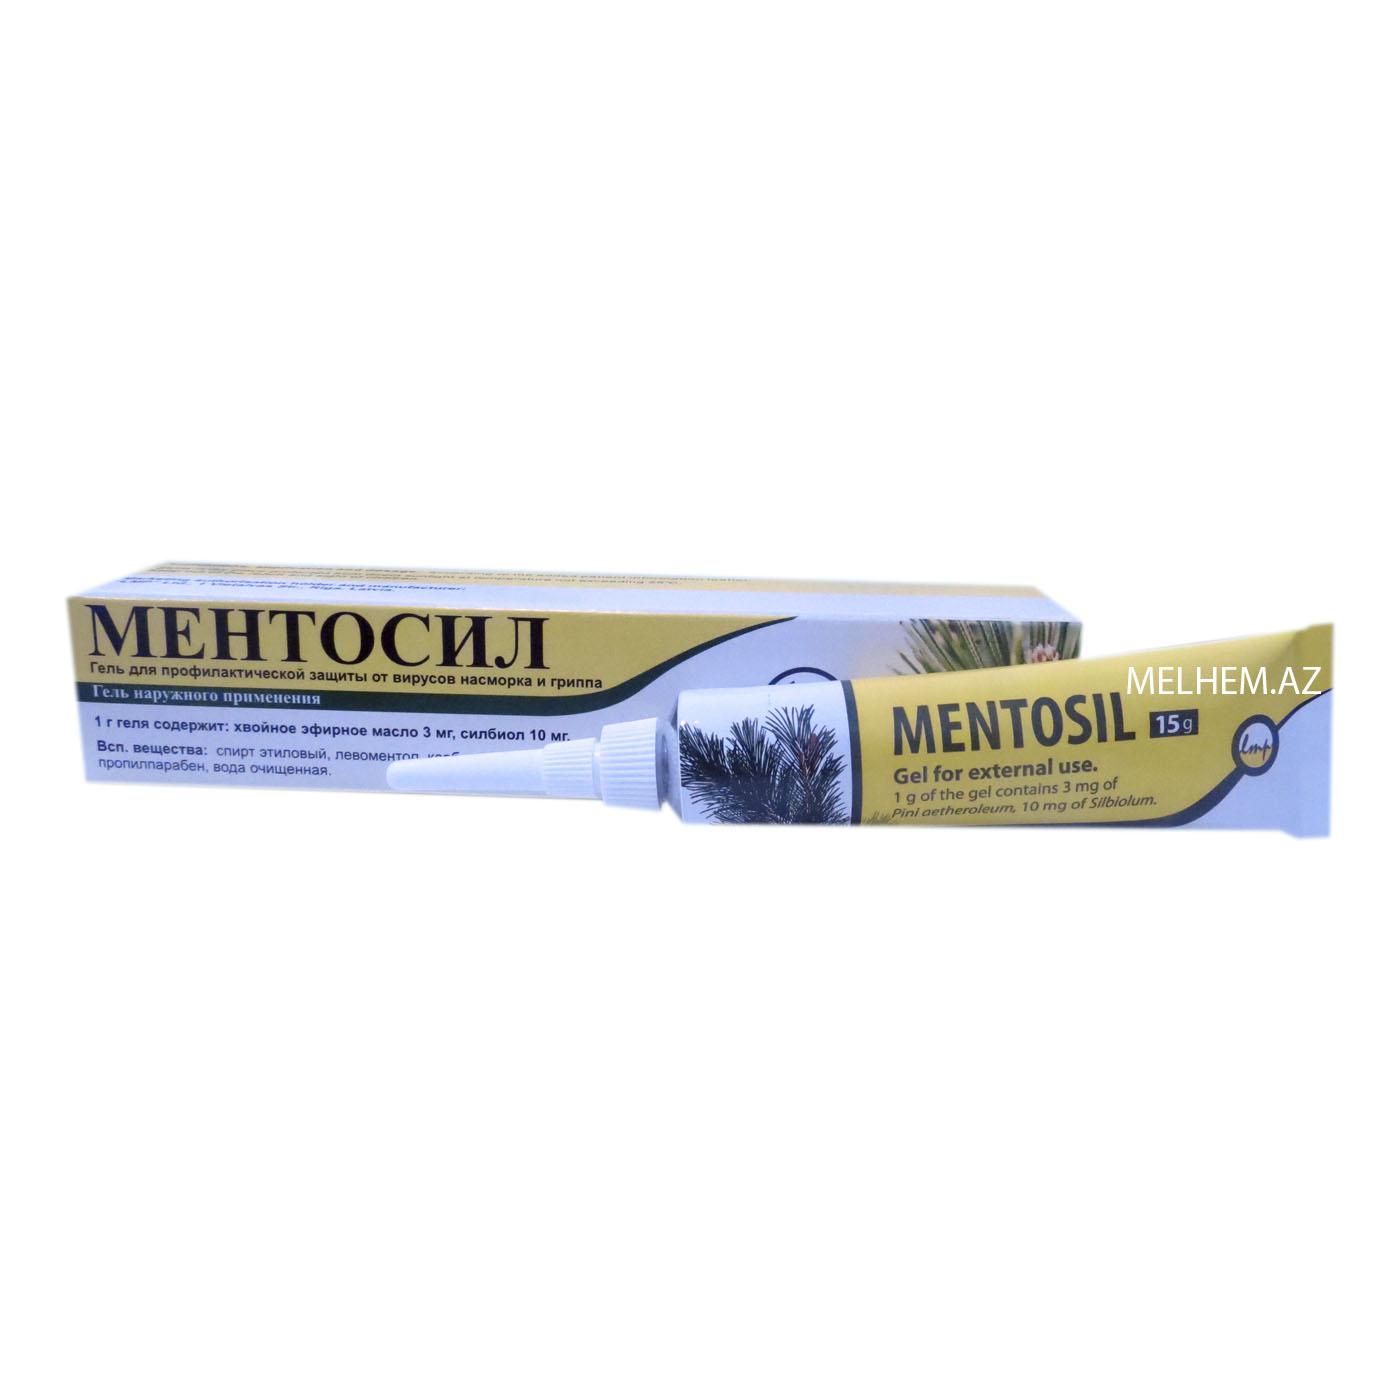 MENTOSIL 15 Q GEL